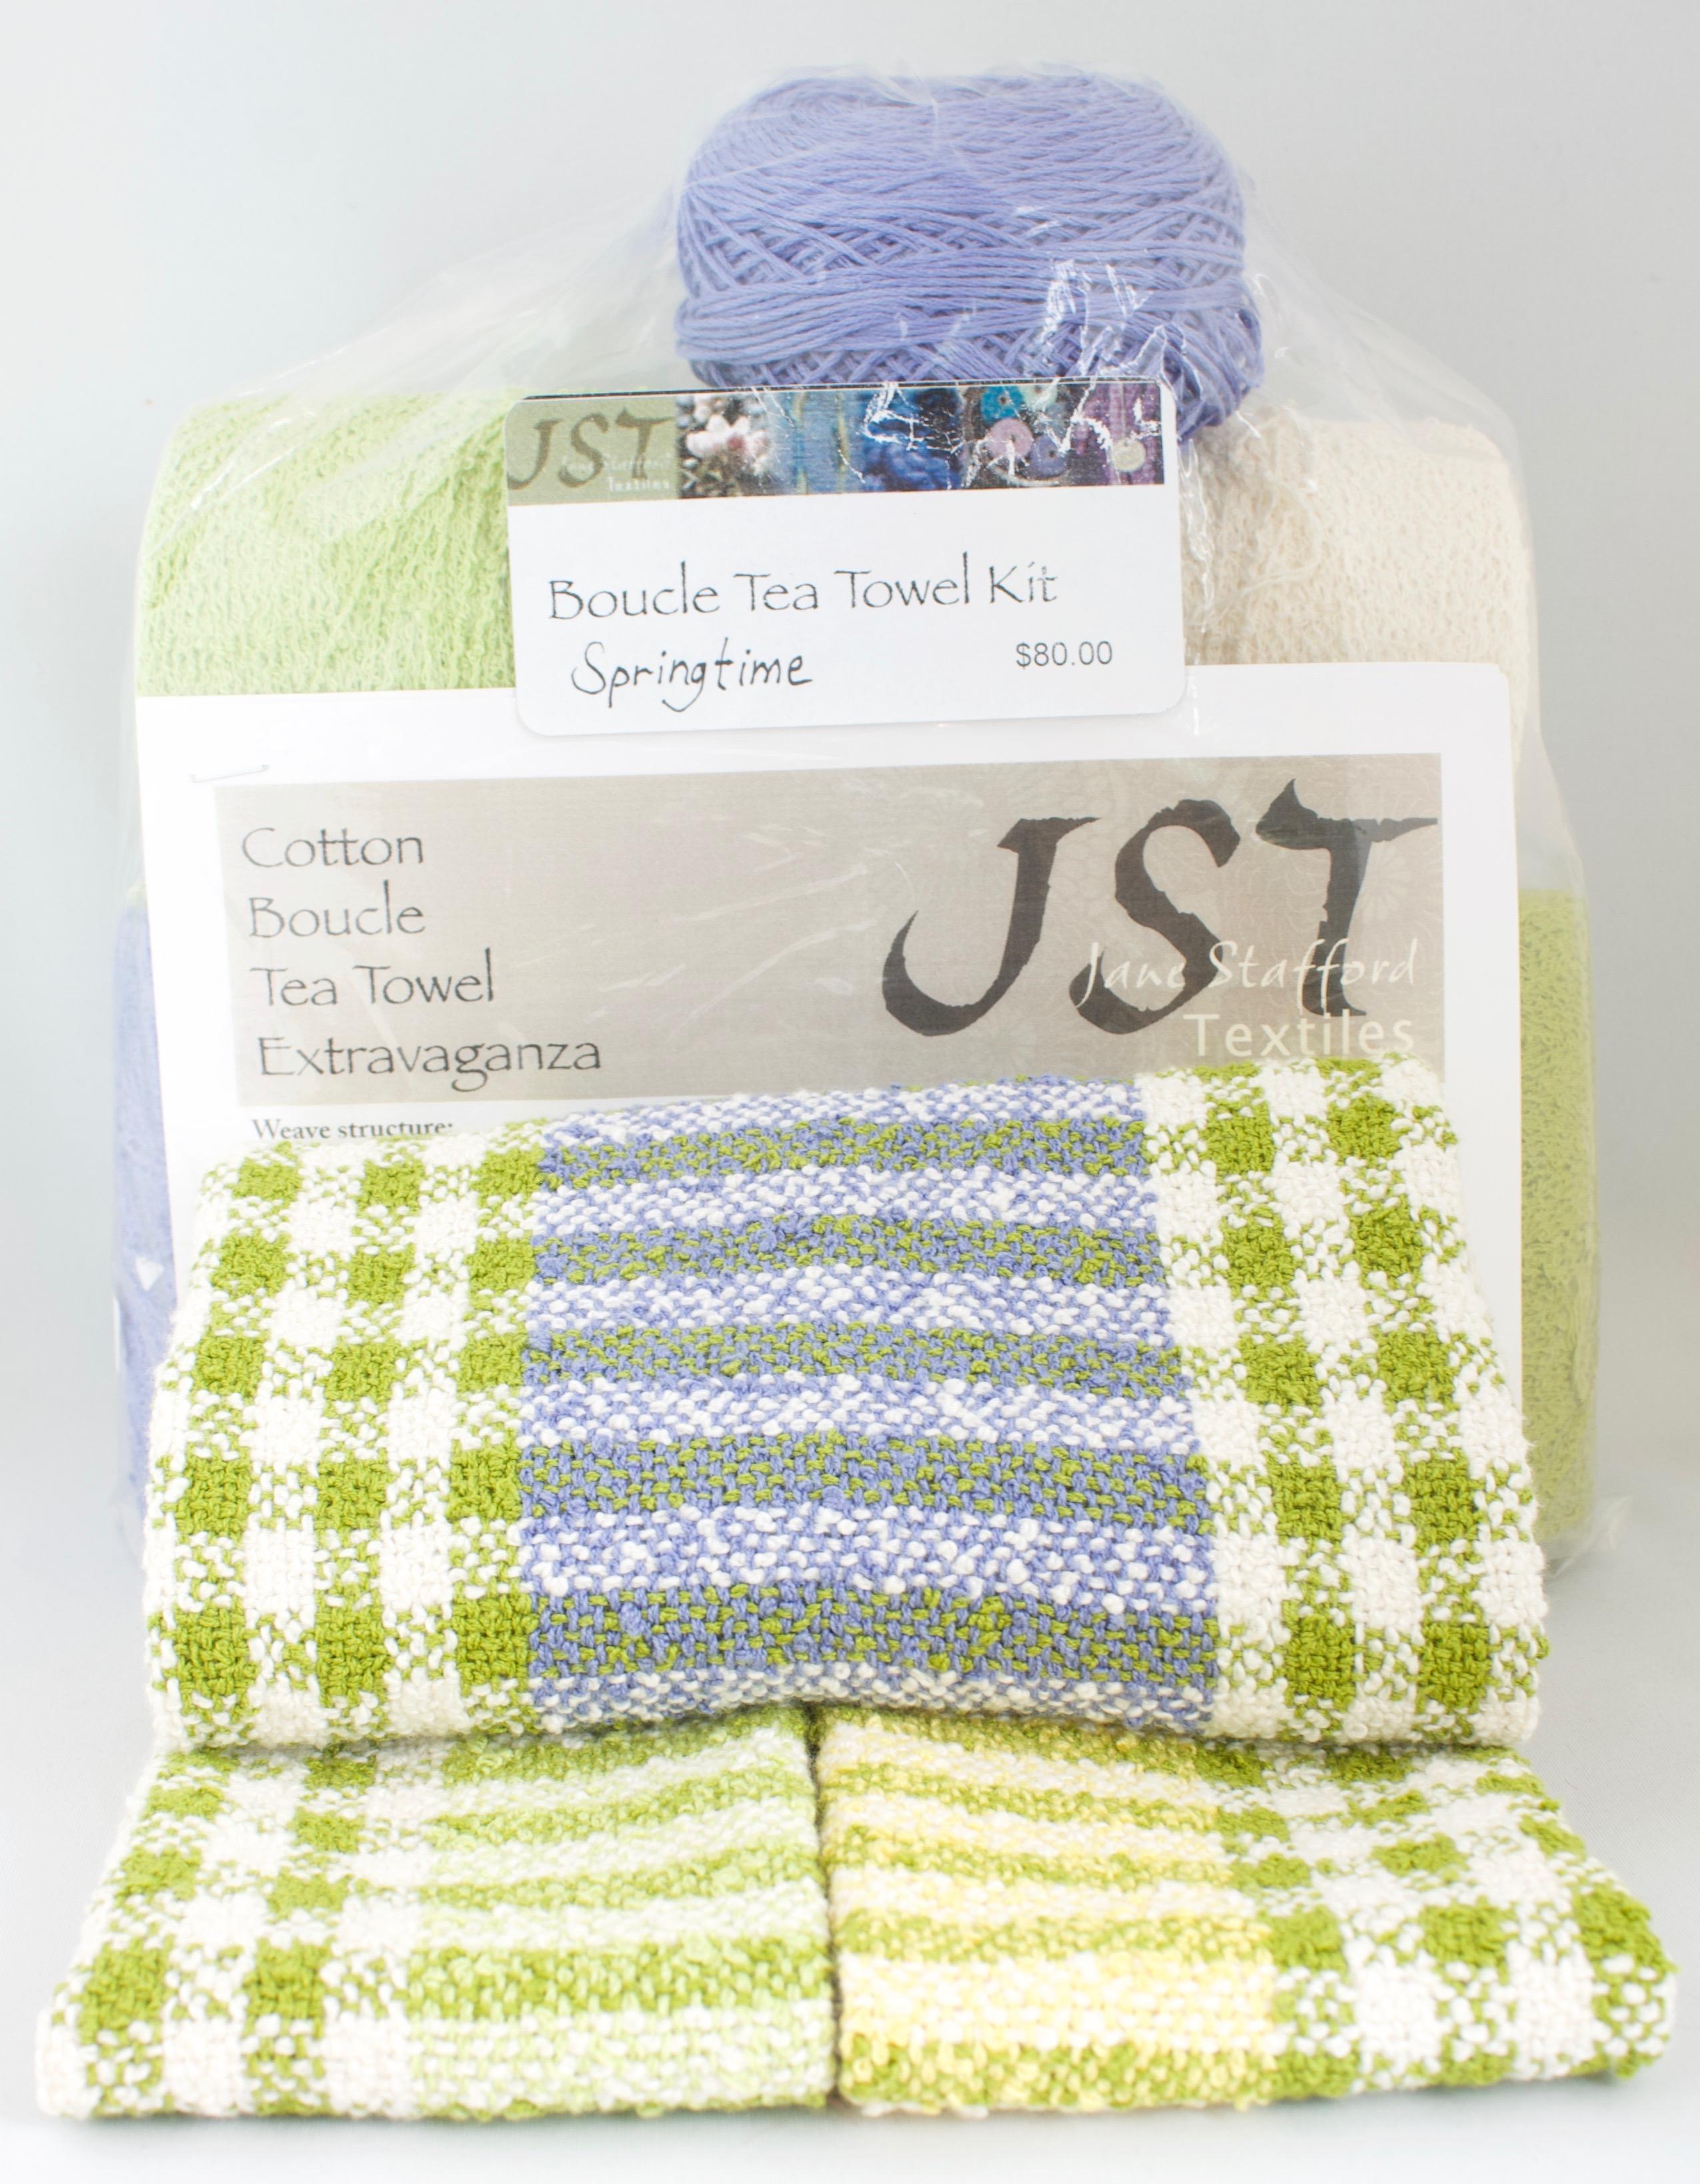 Boucle Tea Towels Kit – Springtime – Jane Stafford Textiles